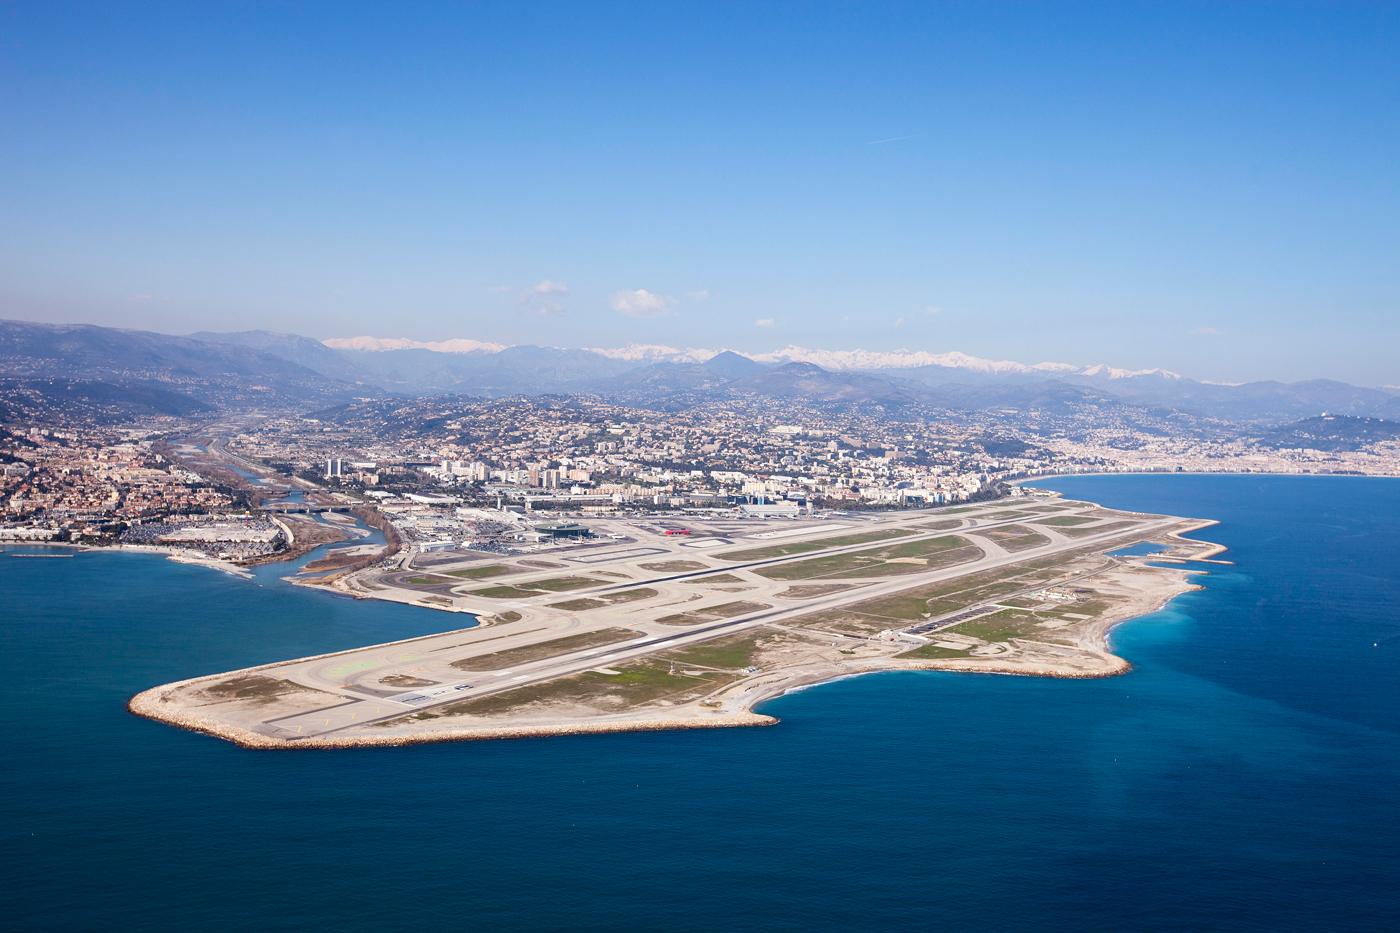 Vue-Aerienne-Aeroport-Nice